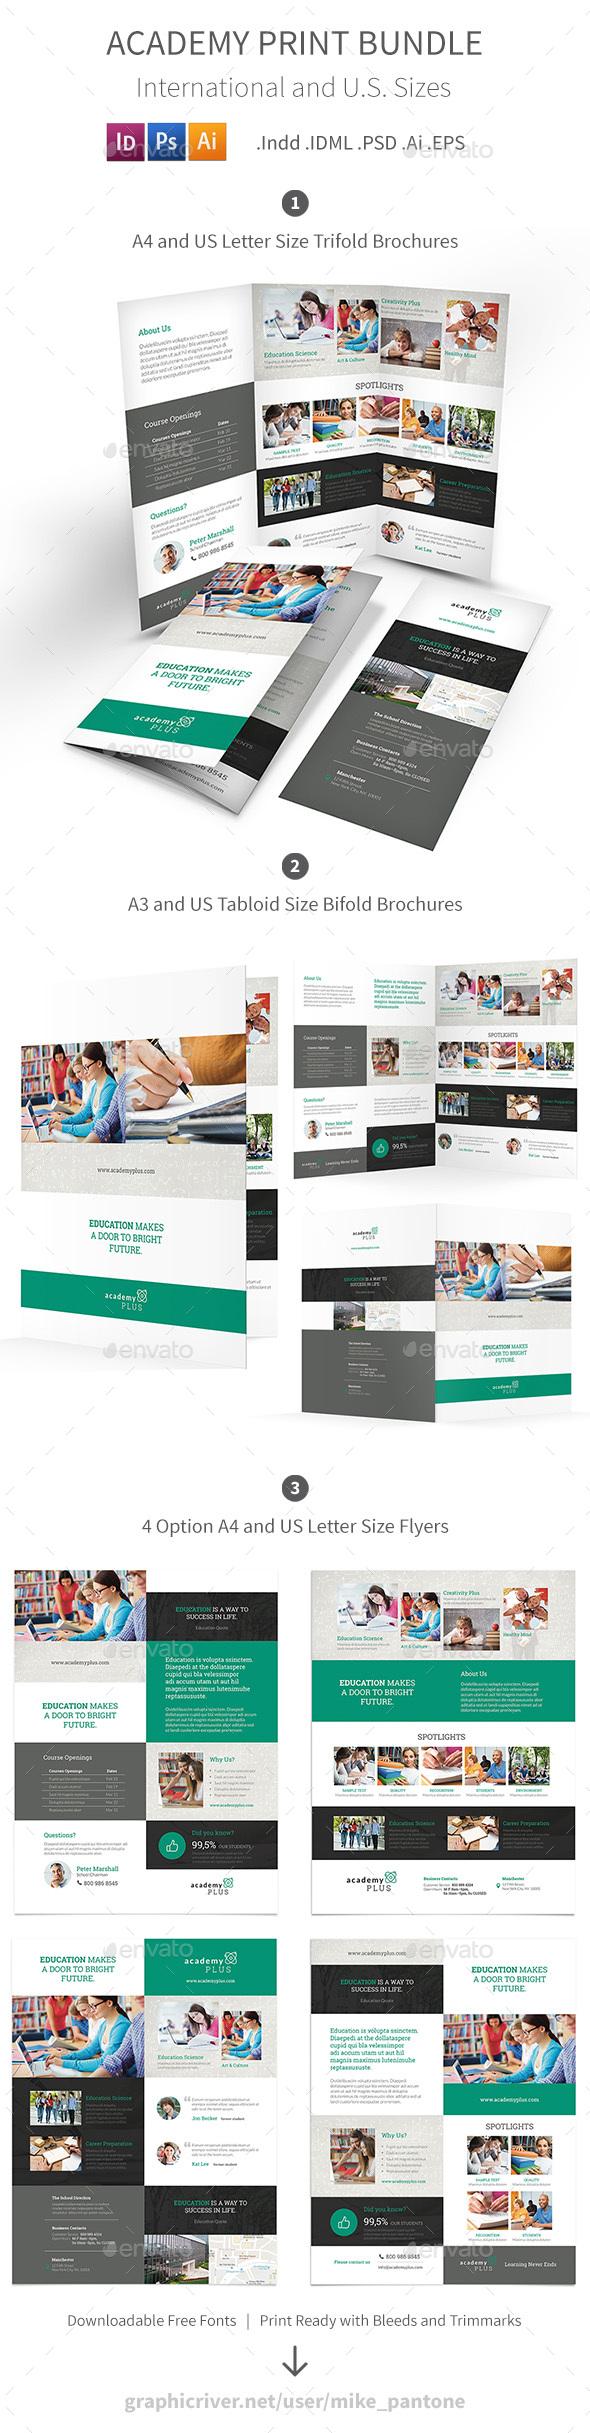 Academy Print Bundle - Informational Brochures